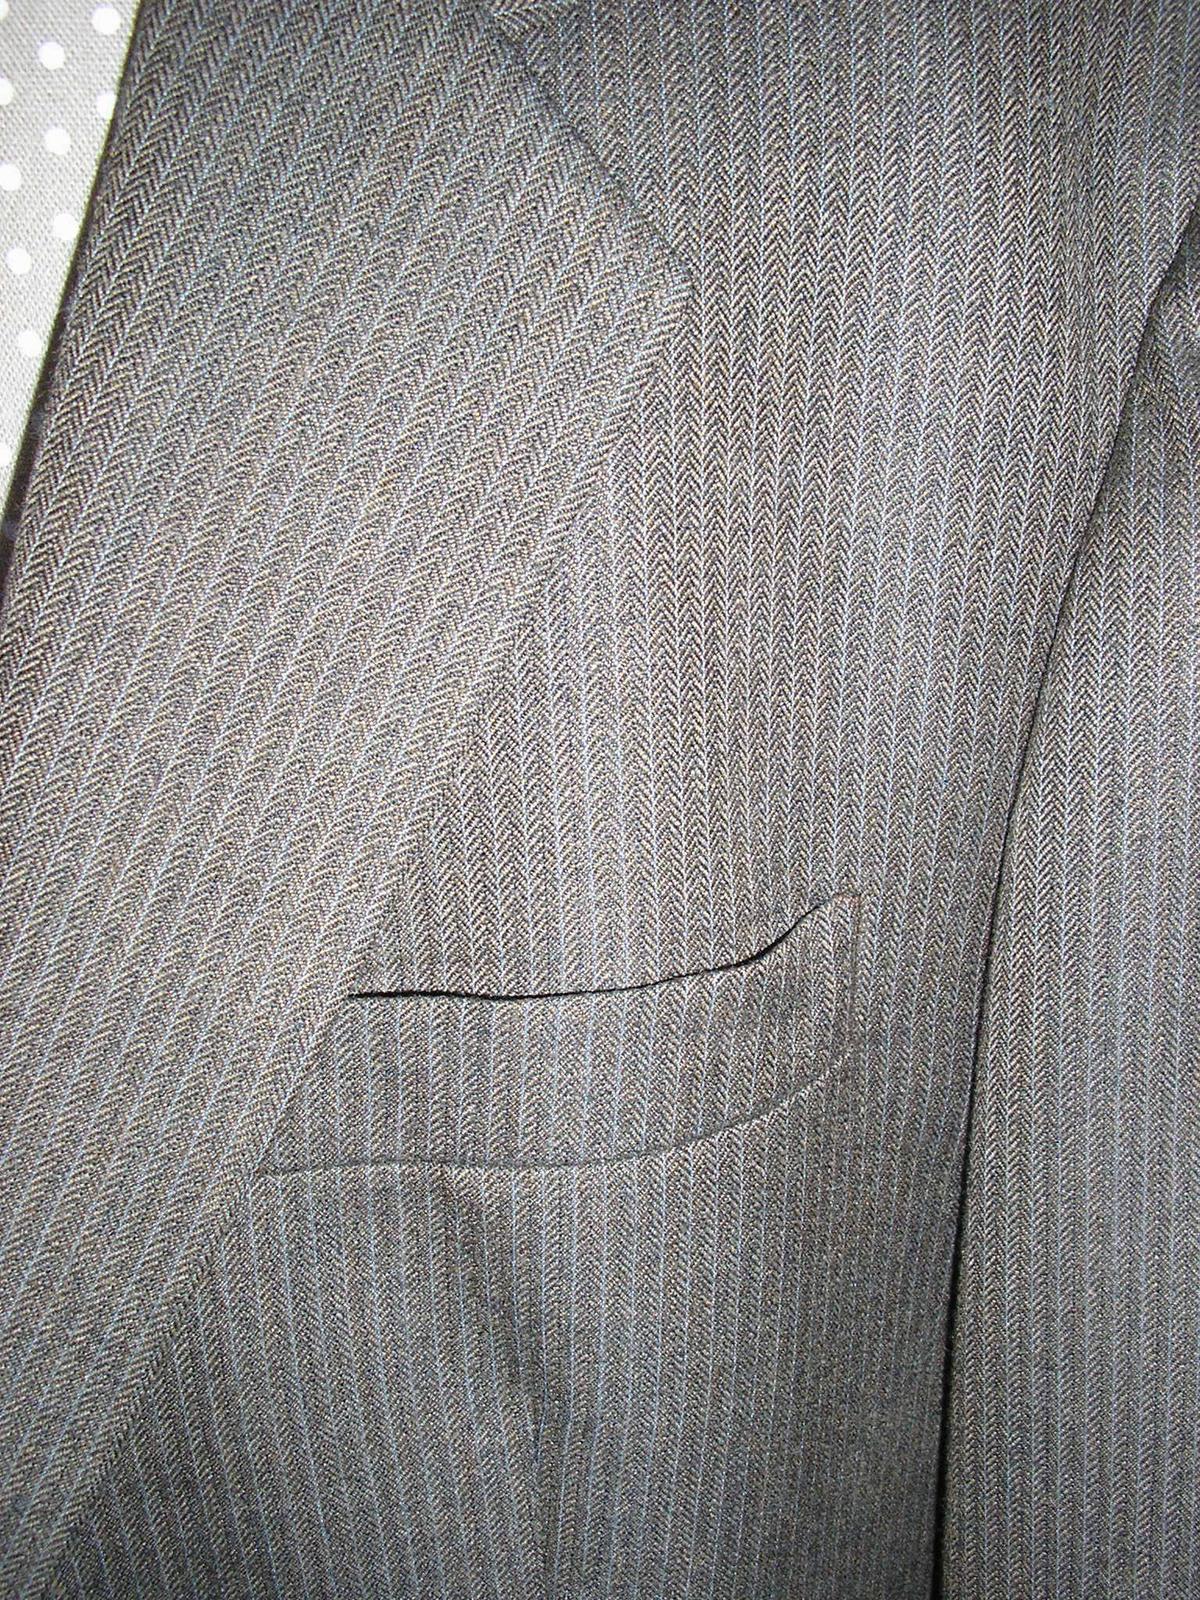 1210. Oblek pánsky - Obrázok č. 2